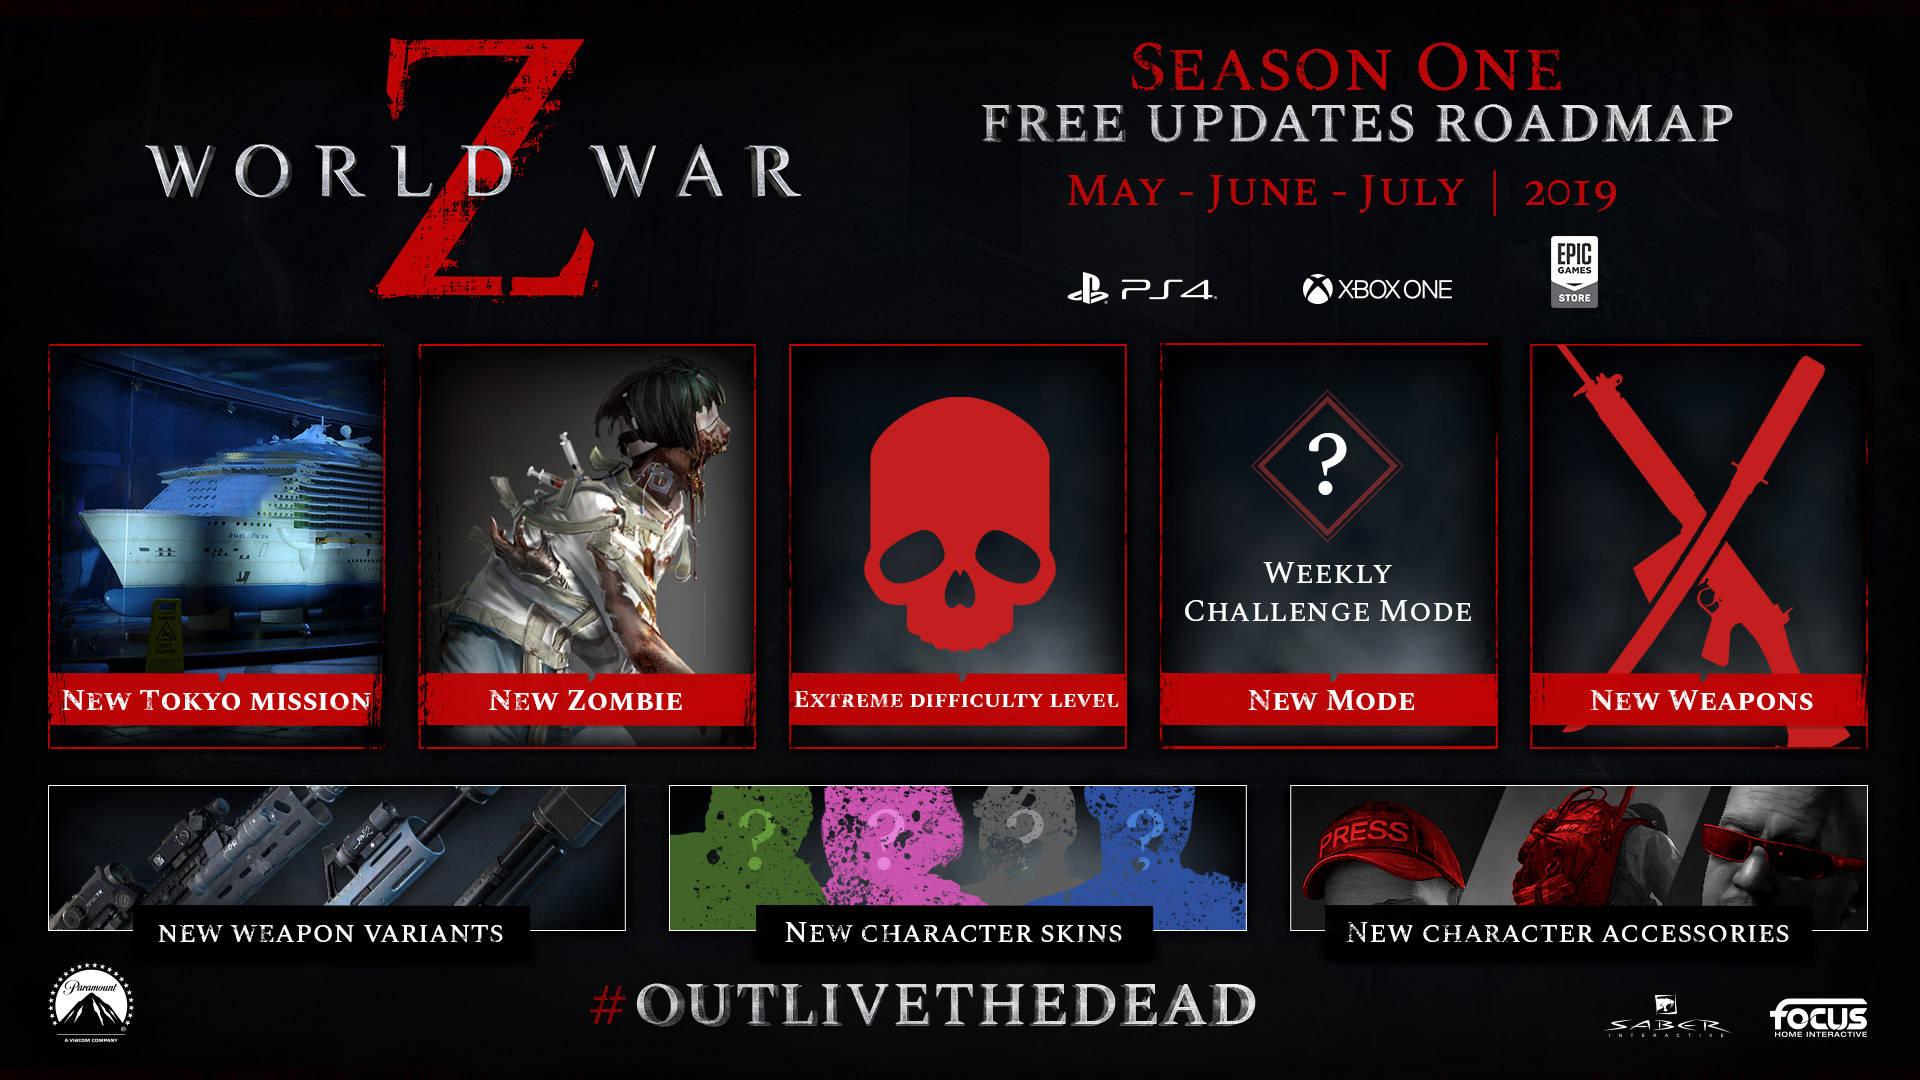 World War Z Roadmap